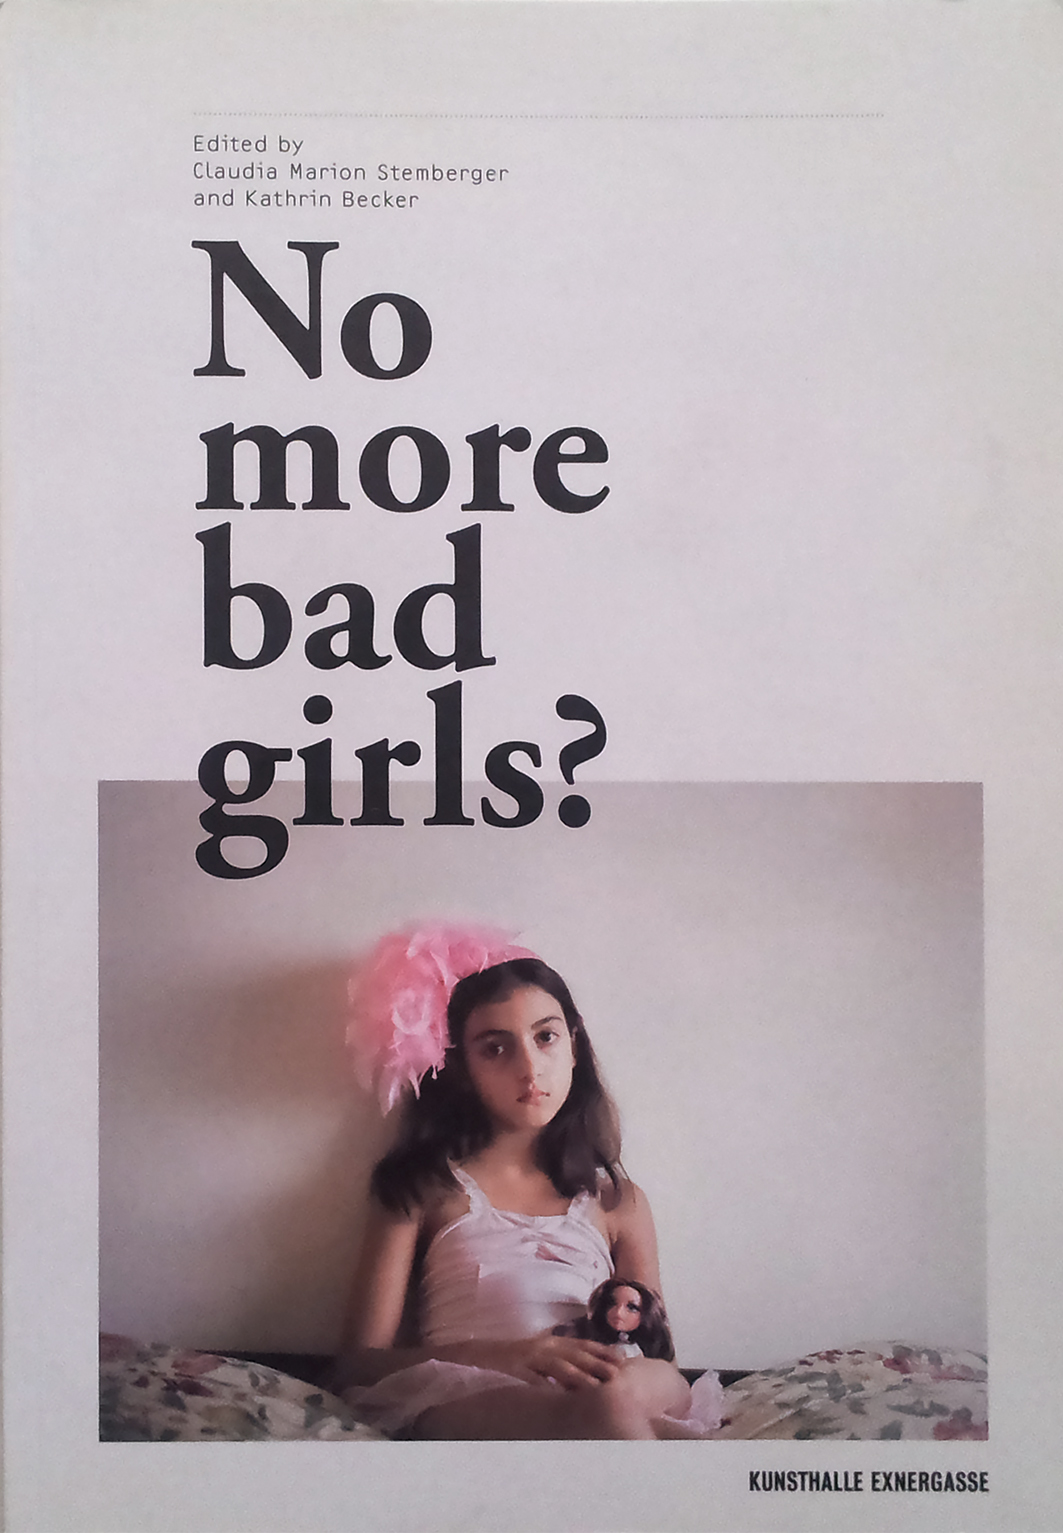 NO MORE BAD GIRLS